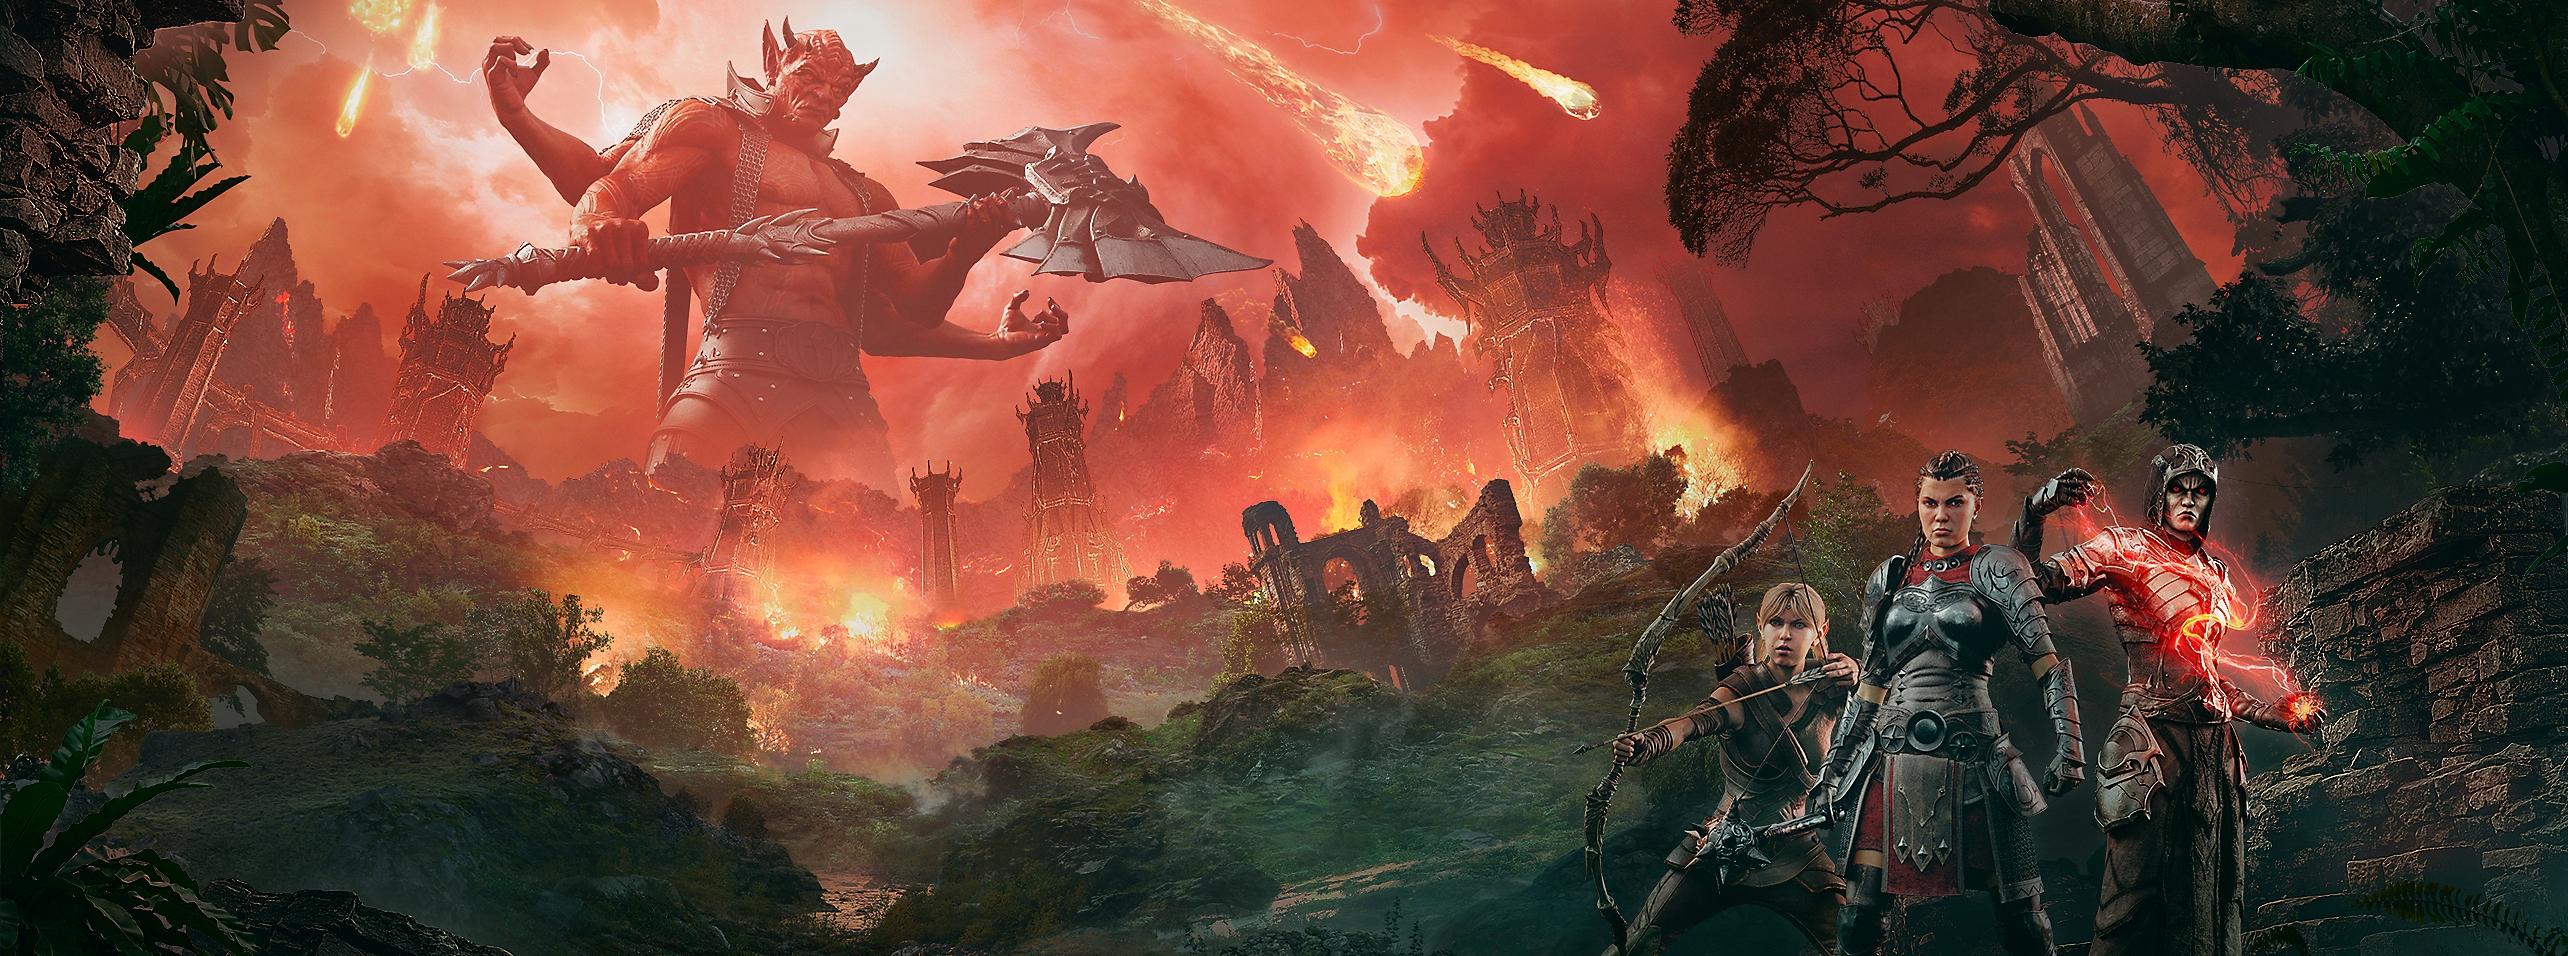 The Elder Scrolls Online - Blackwood key art